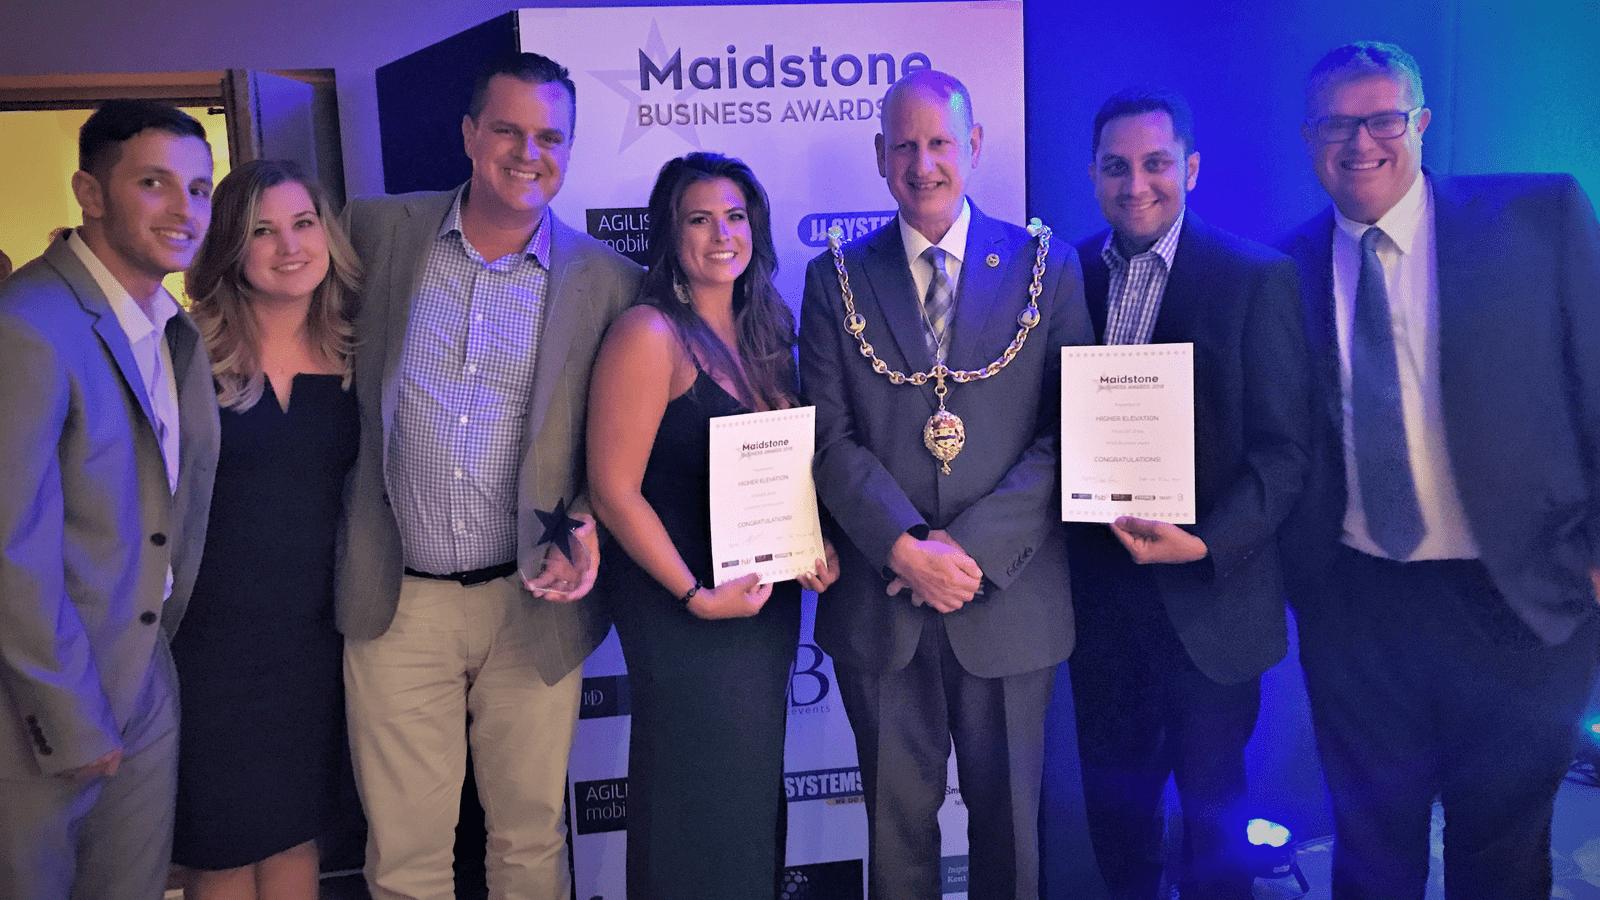 Higher Elevation Ltd Maidstone Business Awards